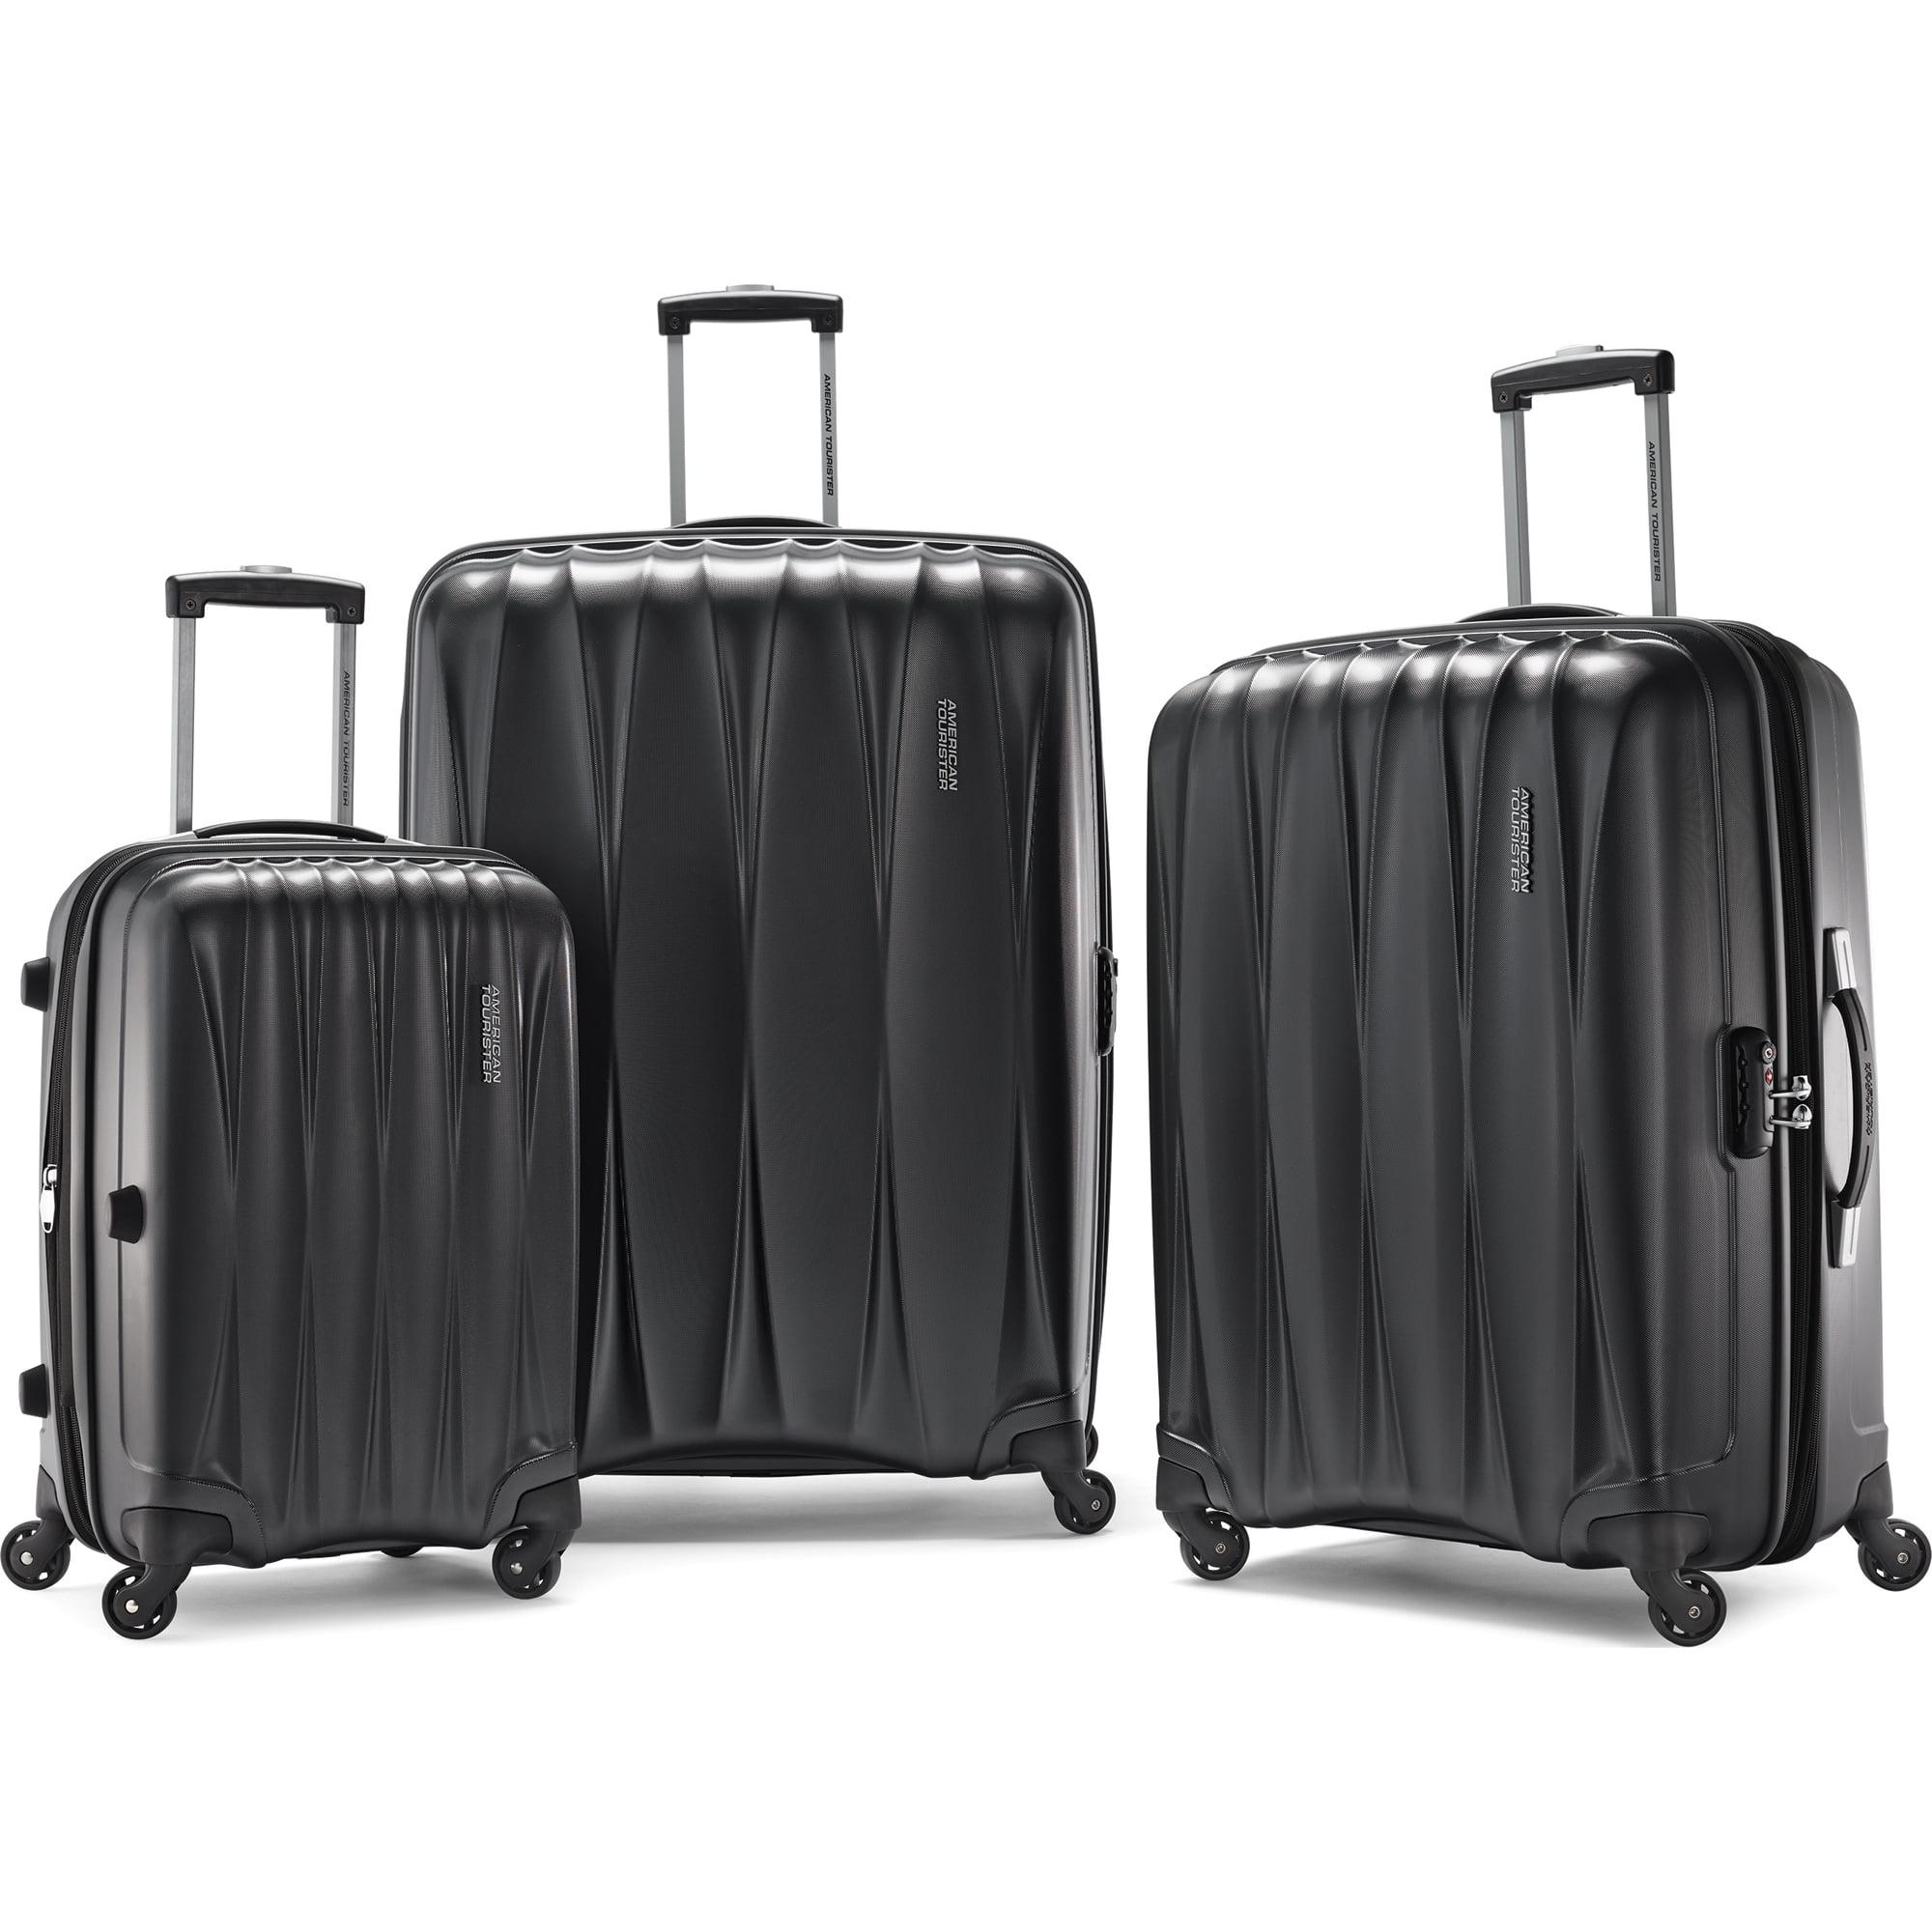 "American Tourister Arona Hardside Spinner 3Pcs Luggage Set 20"" 25"" 29"" Charcoal"